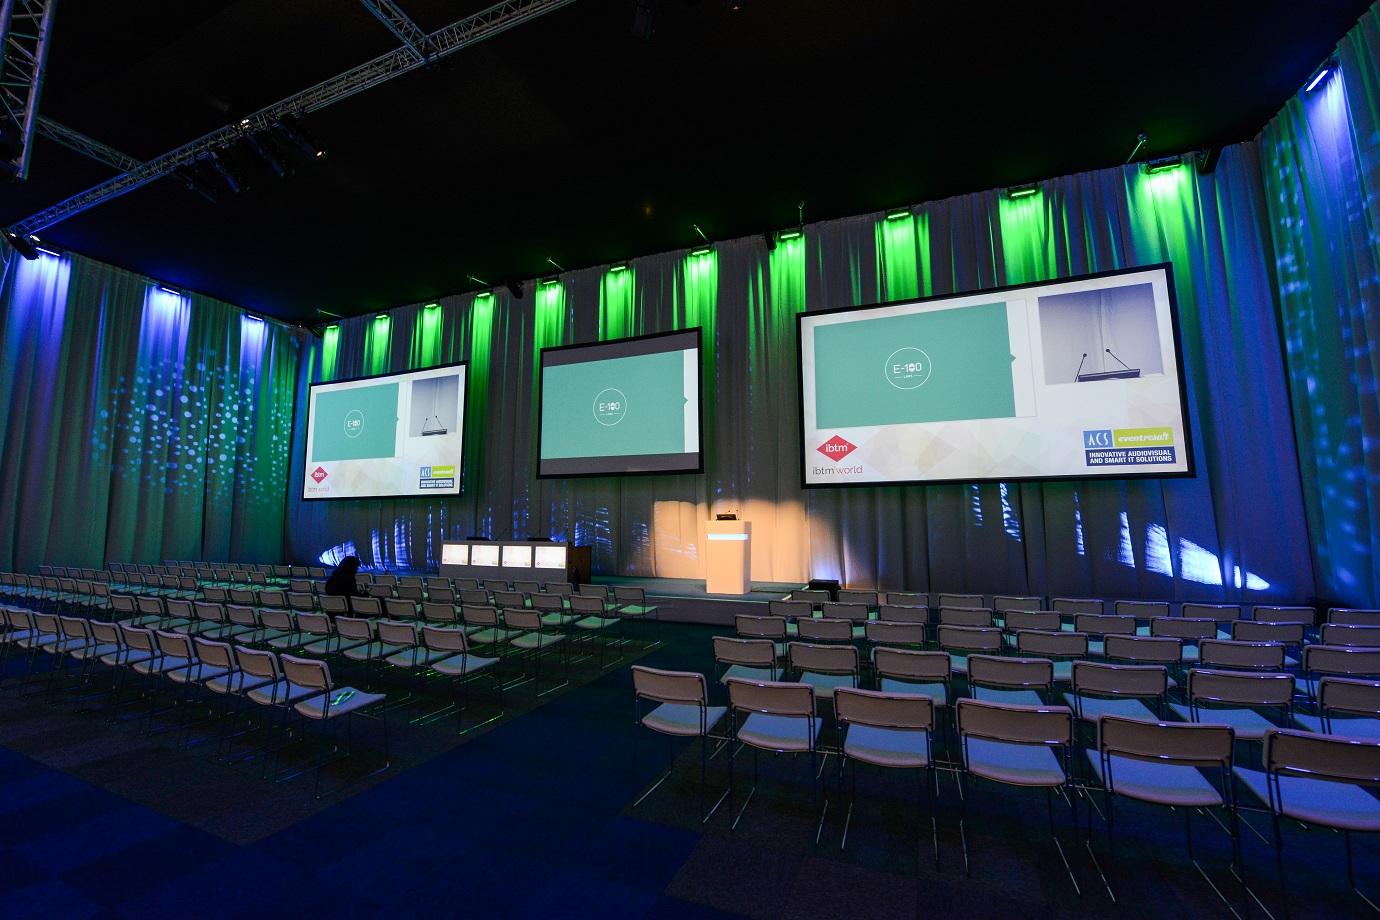 IBTM-world-2015-ACS-audiovisual-solutions-Eventresult